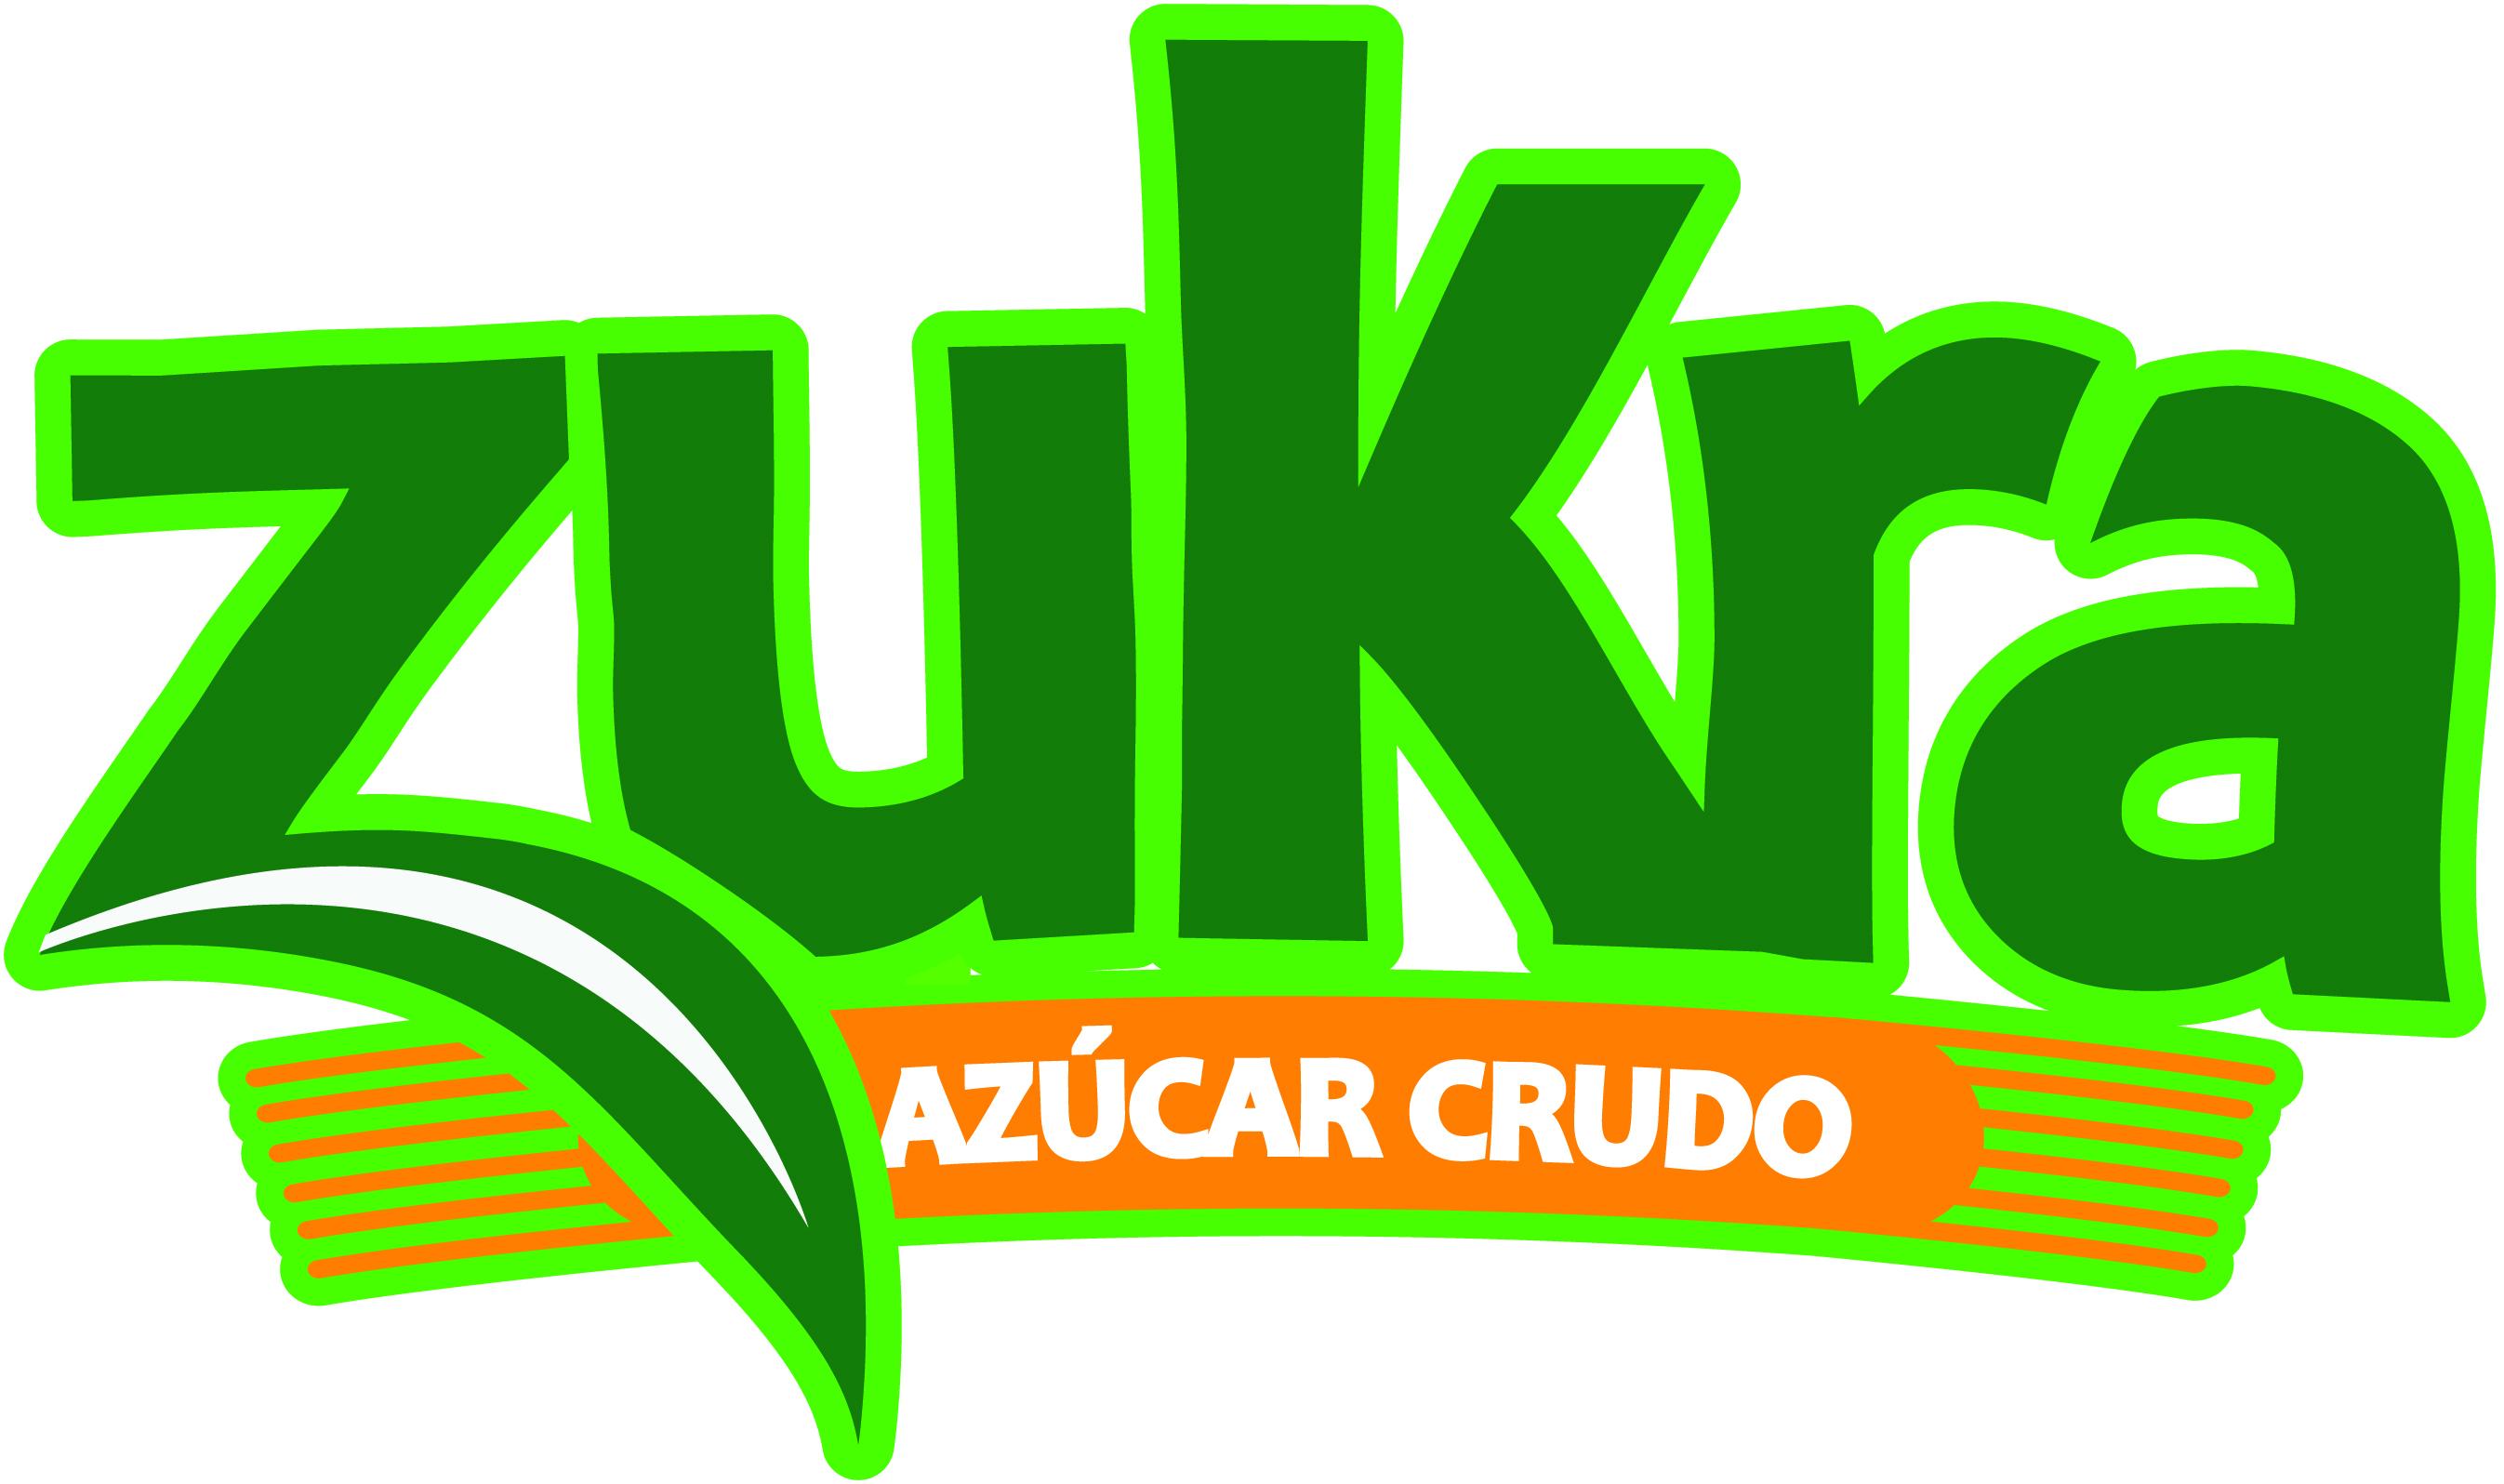 Zukra-editable-1